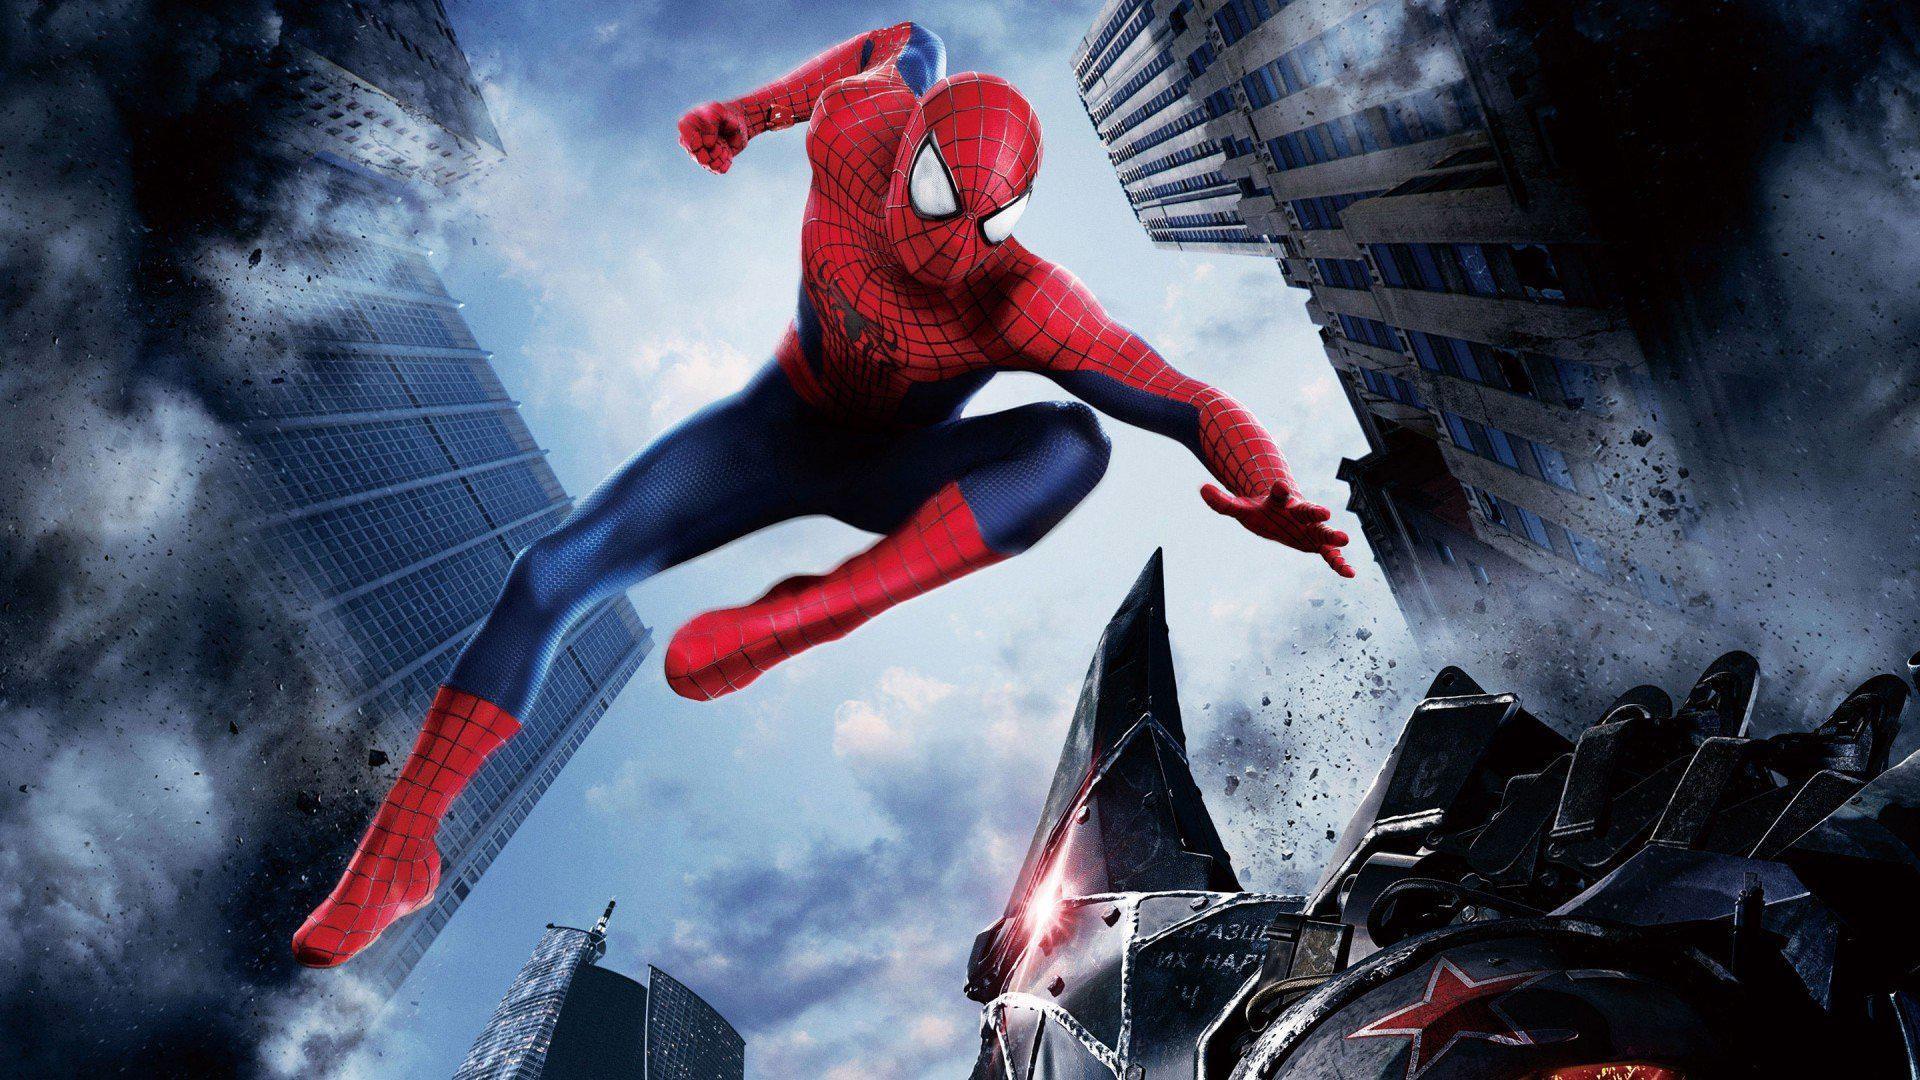 amazing_spider_man_action_adventure_fantasy_movie_marvel wallpaper